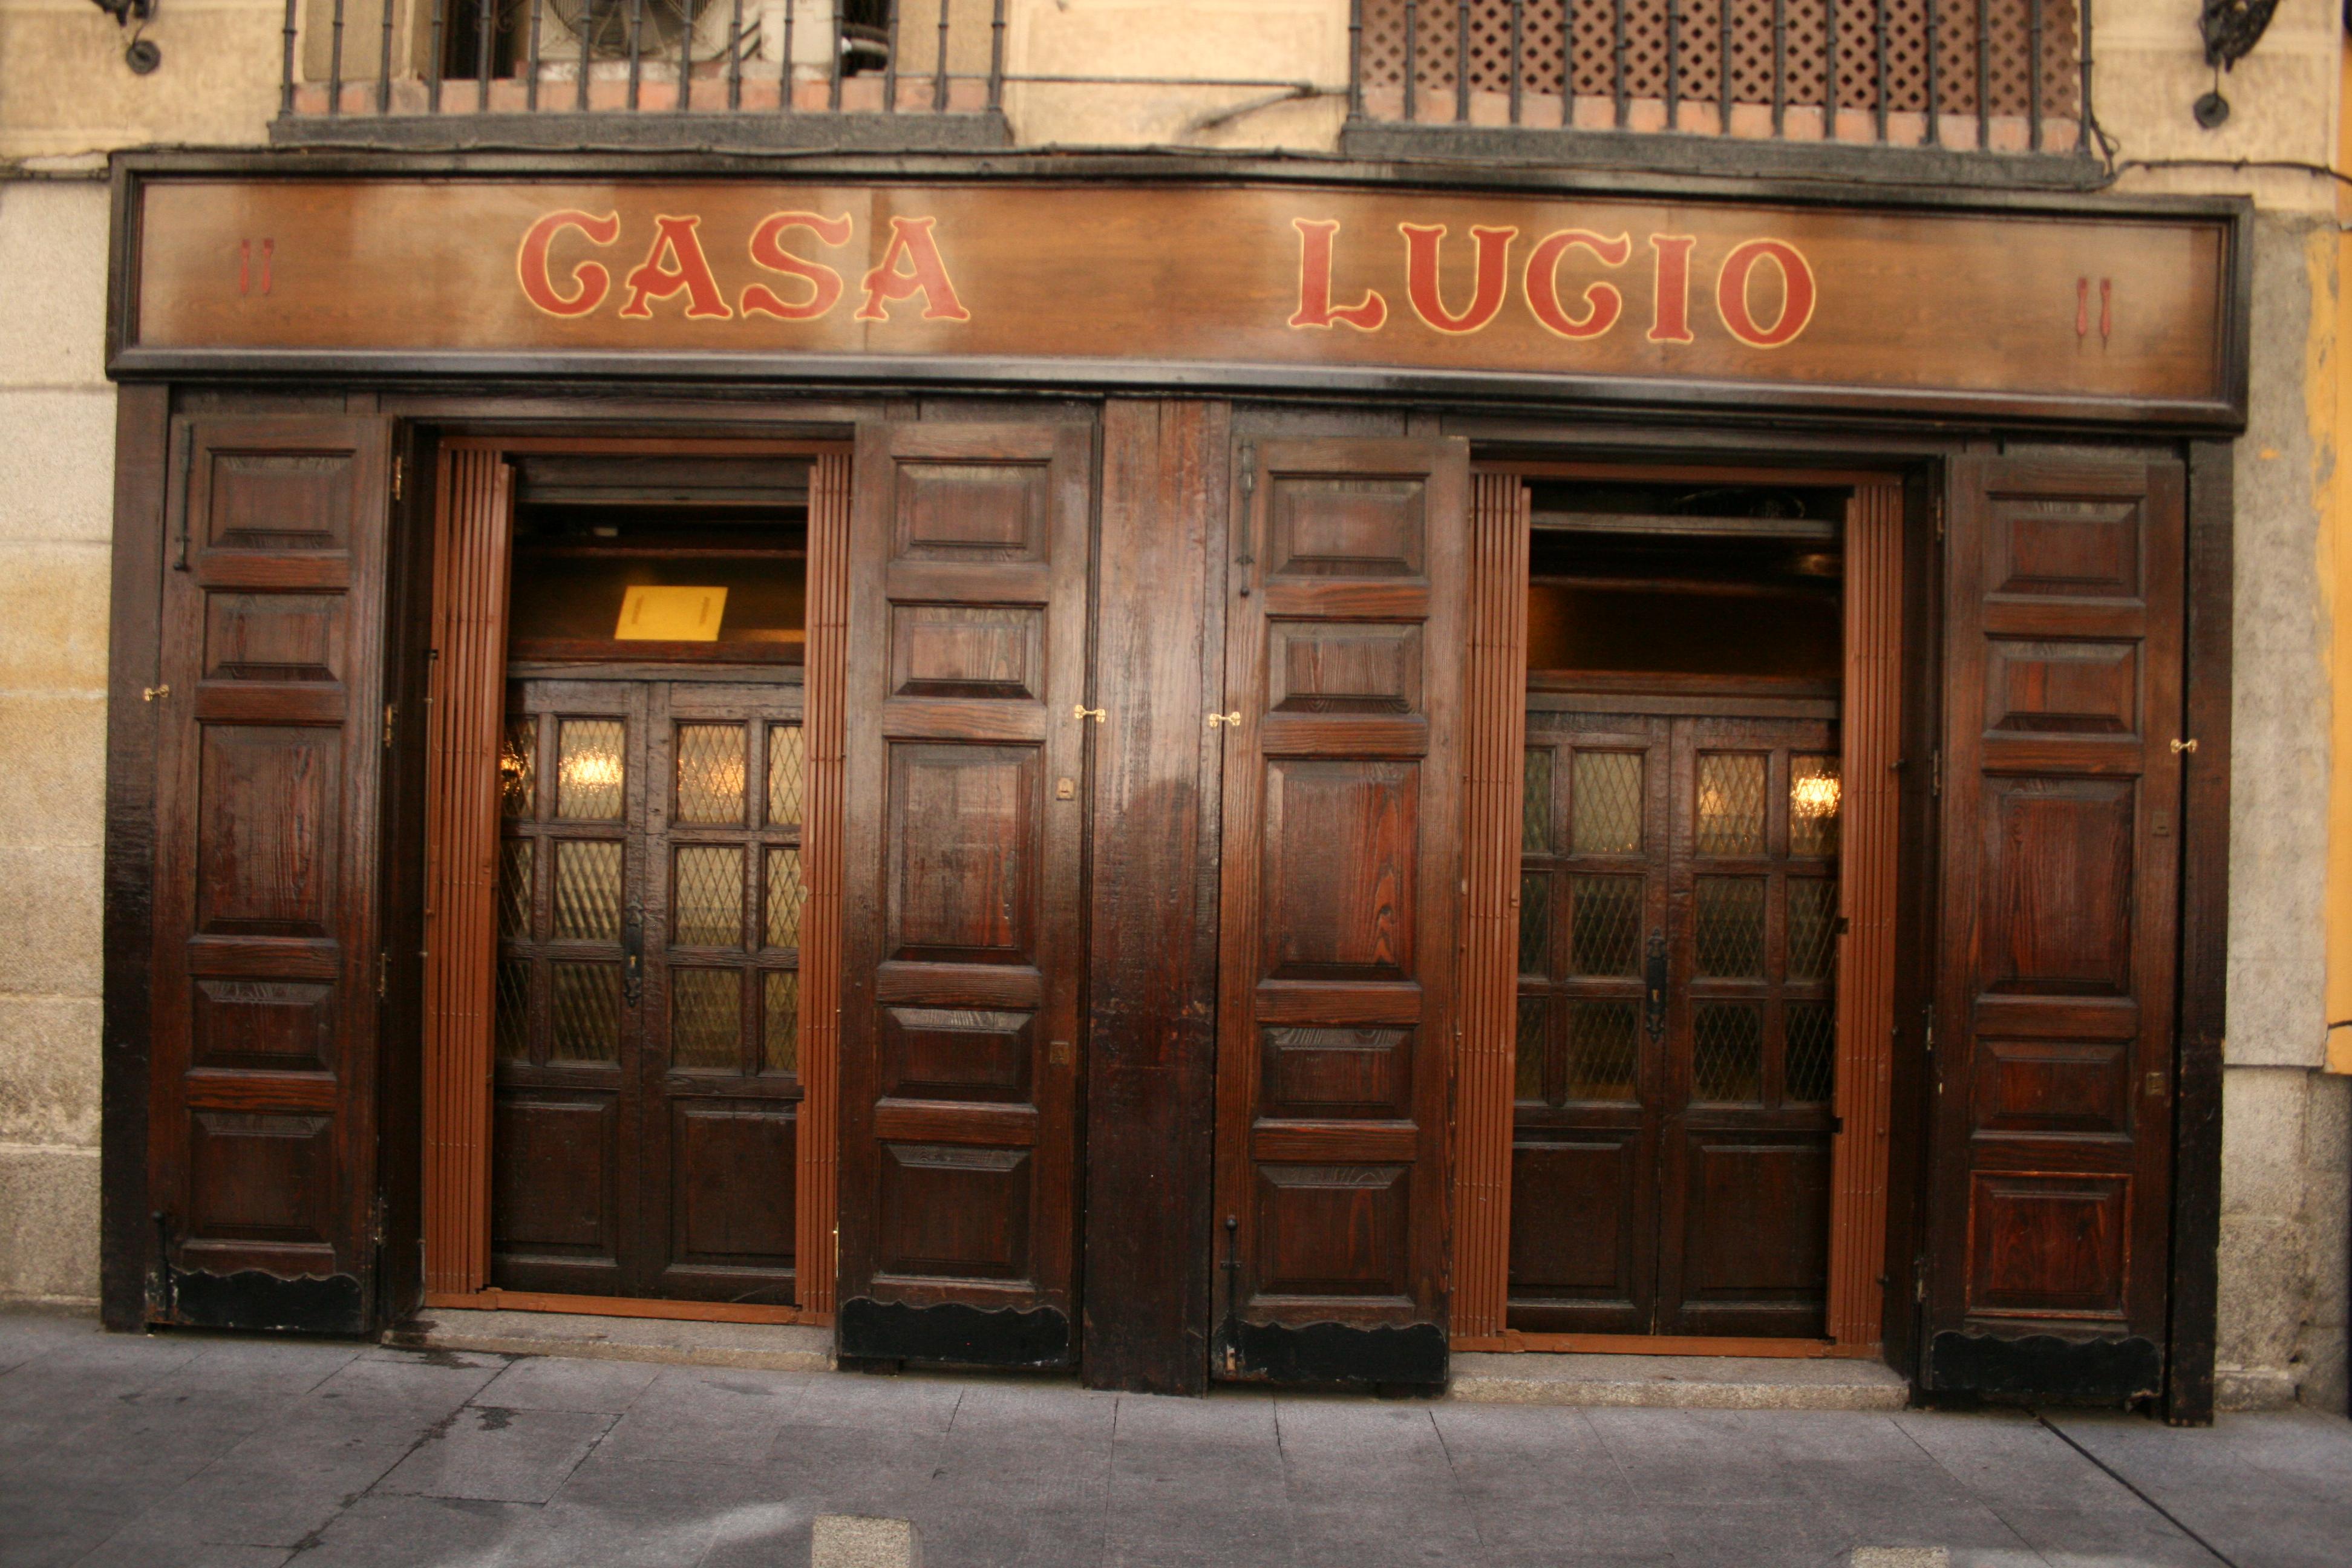 Depiction of Casa Lucio